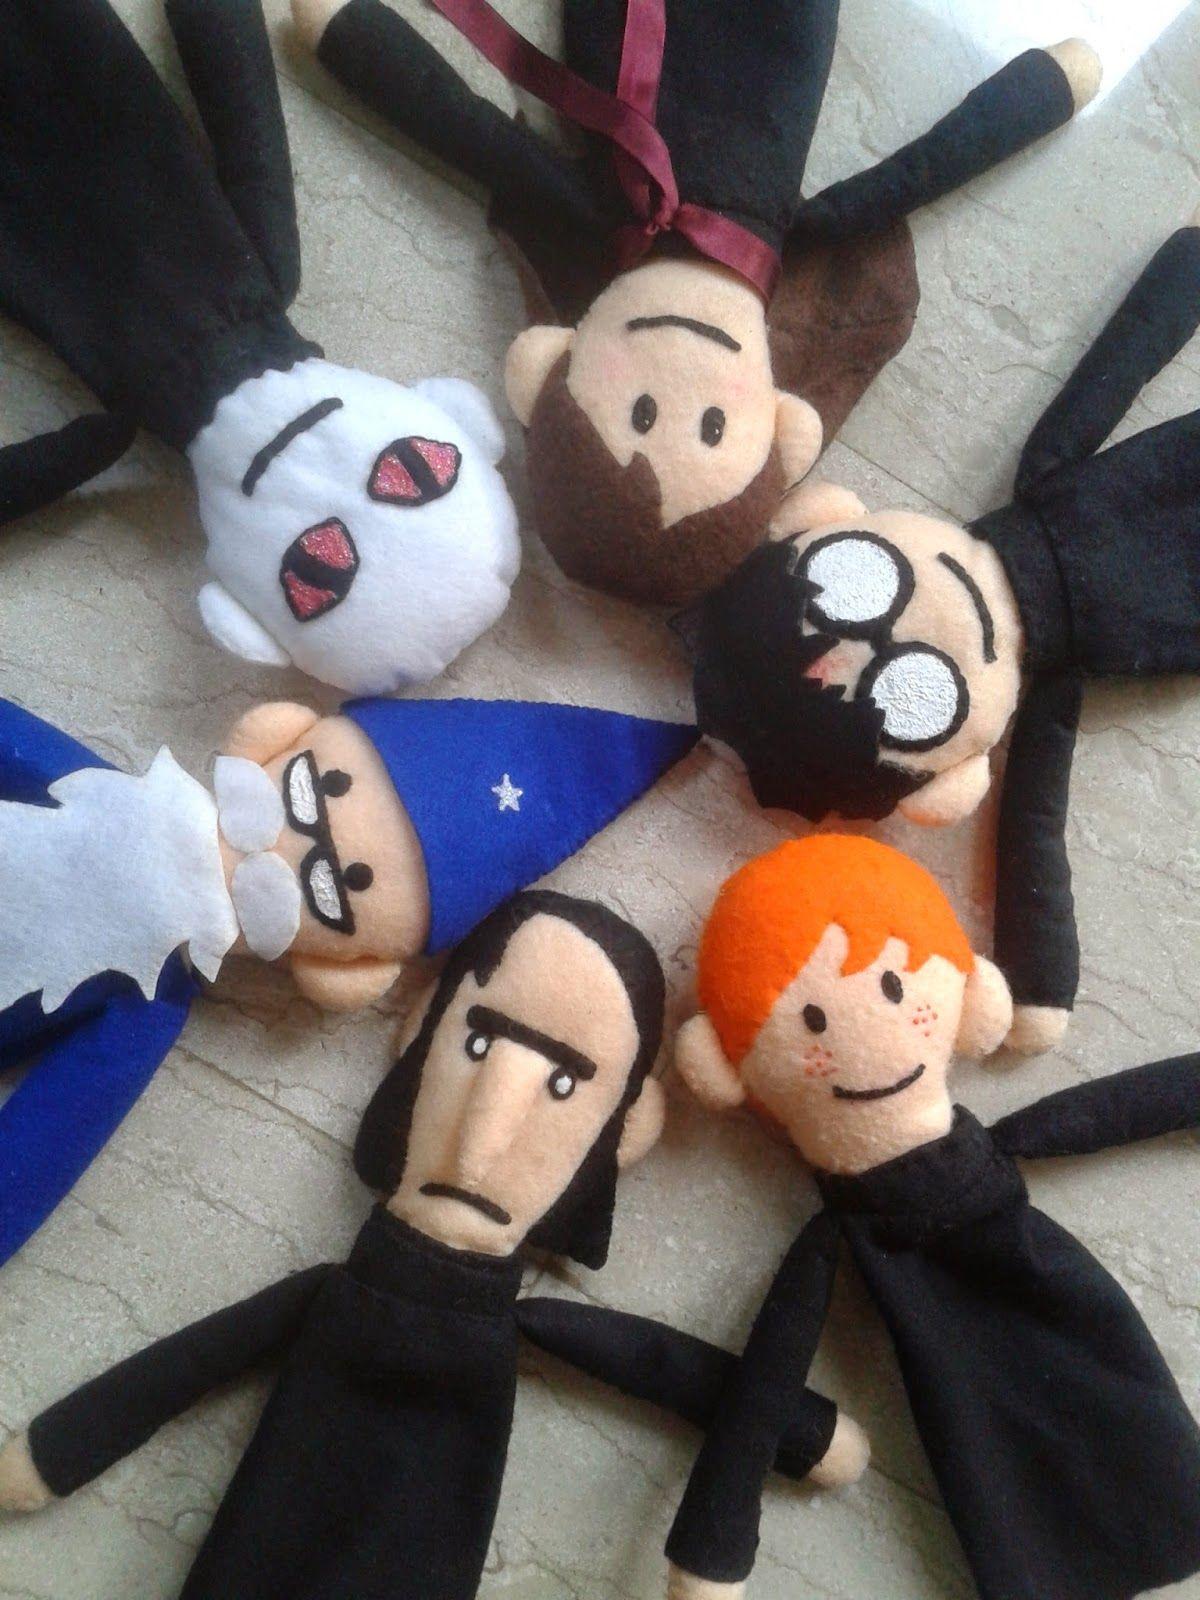 The Crafty Porpupine Diy Project Harry Potter Puppet Pals Harry Potter Puppets Harry Potter Dolls Harry Potter Puppet Pals